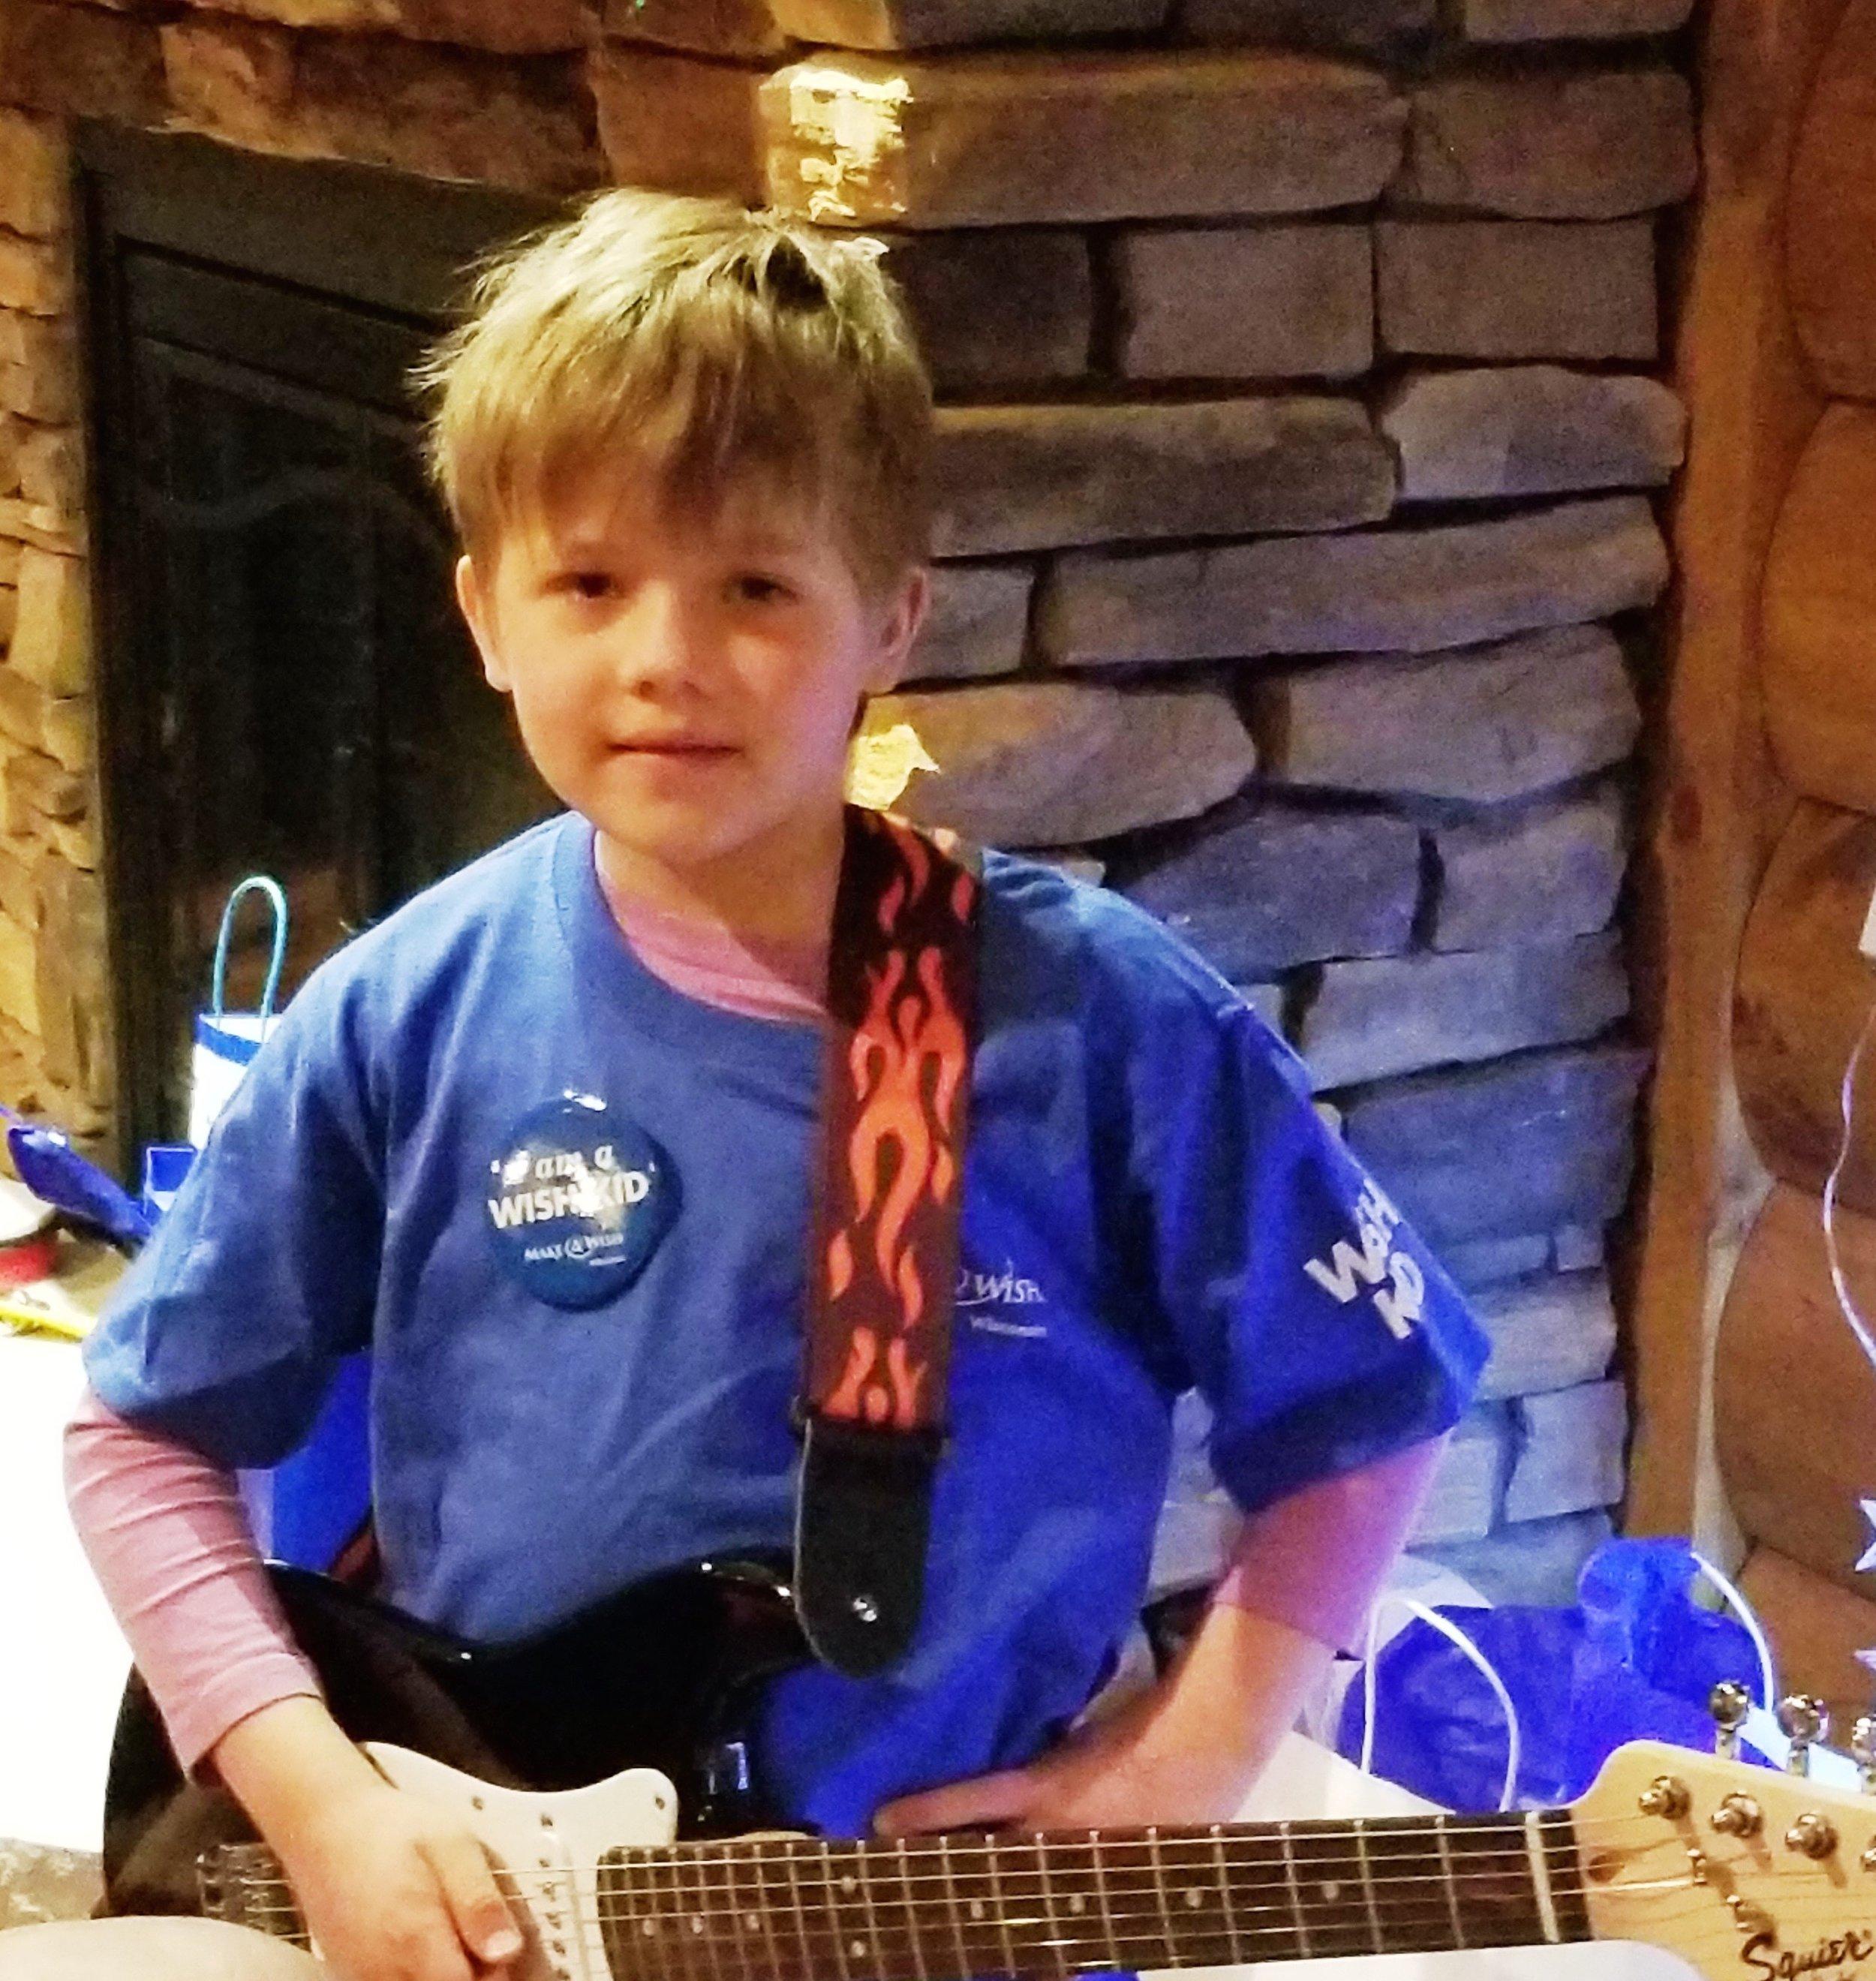 Wish recipient ilya with his new guitar.